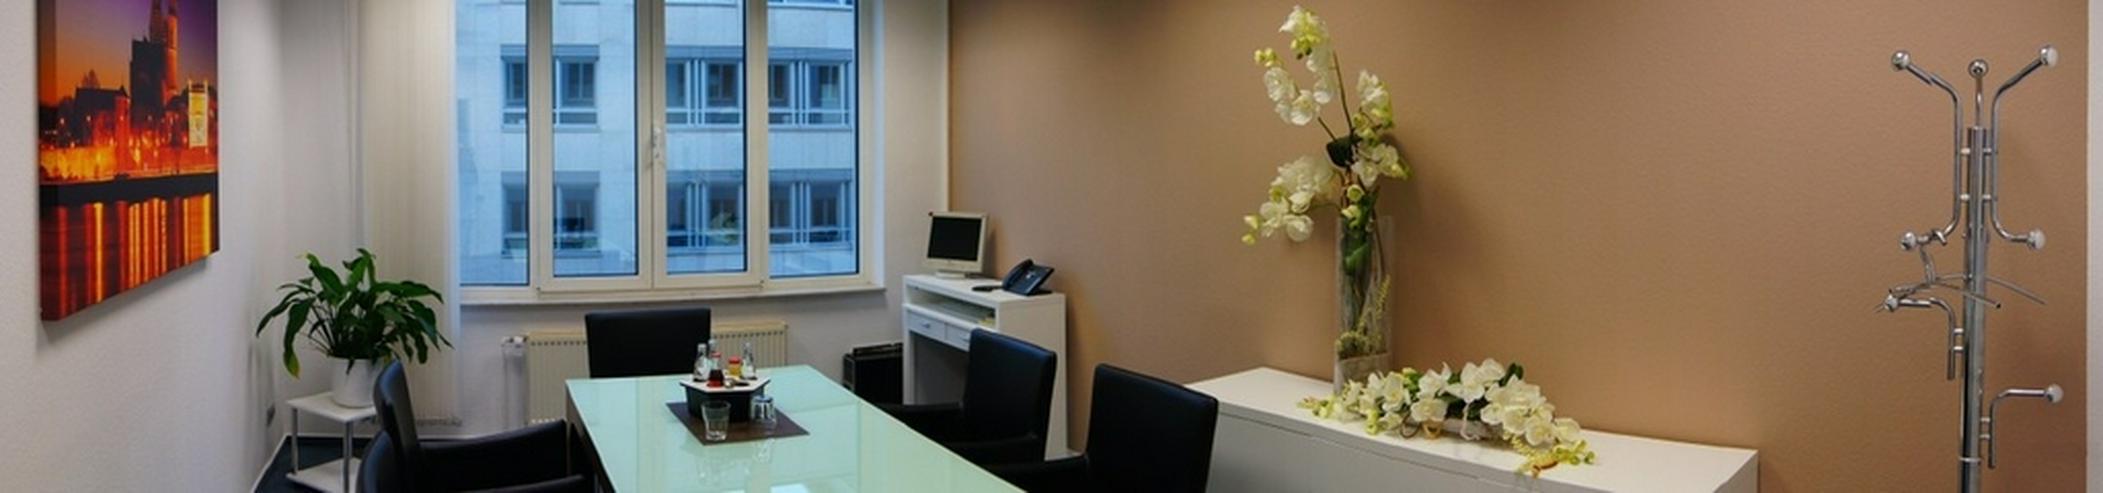 Bild 2: Konferenzraum, Besprechungsräume, Meetingräume